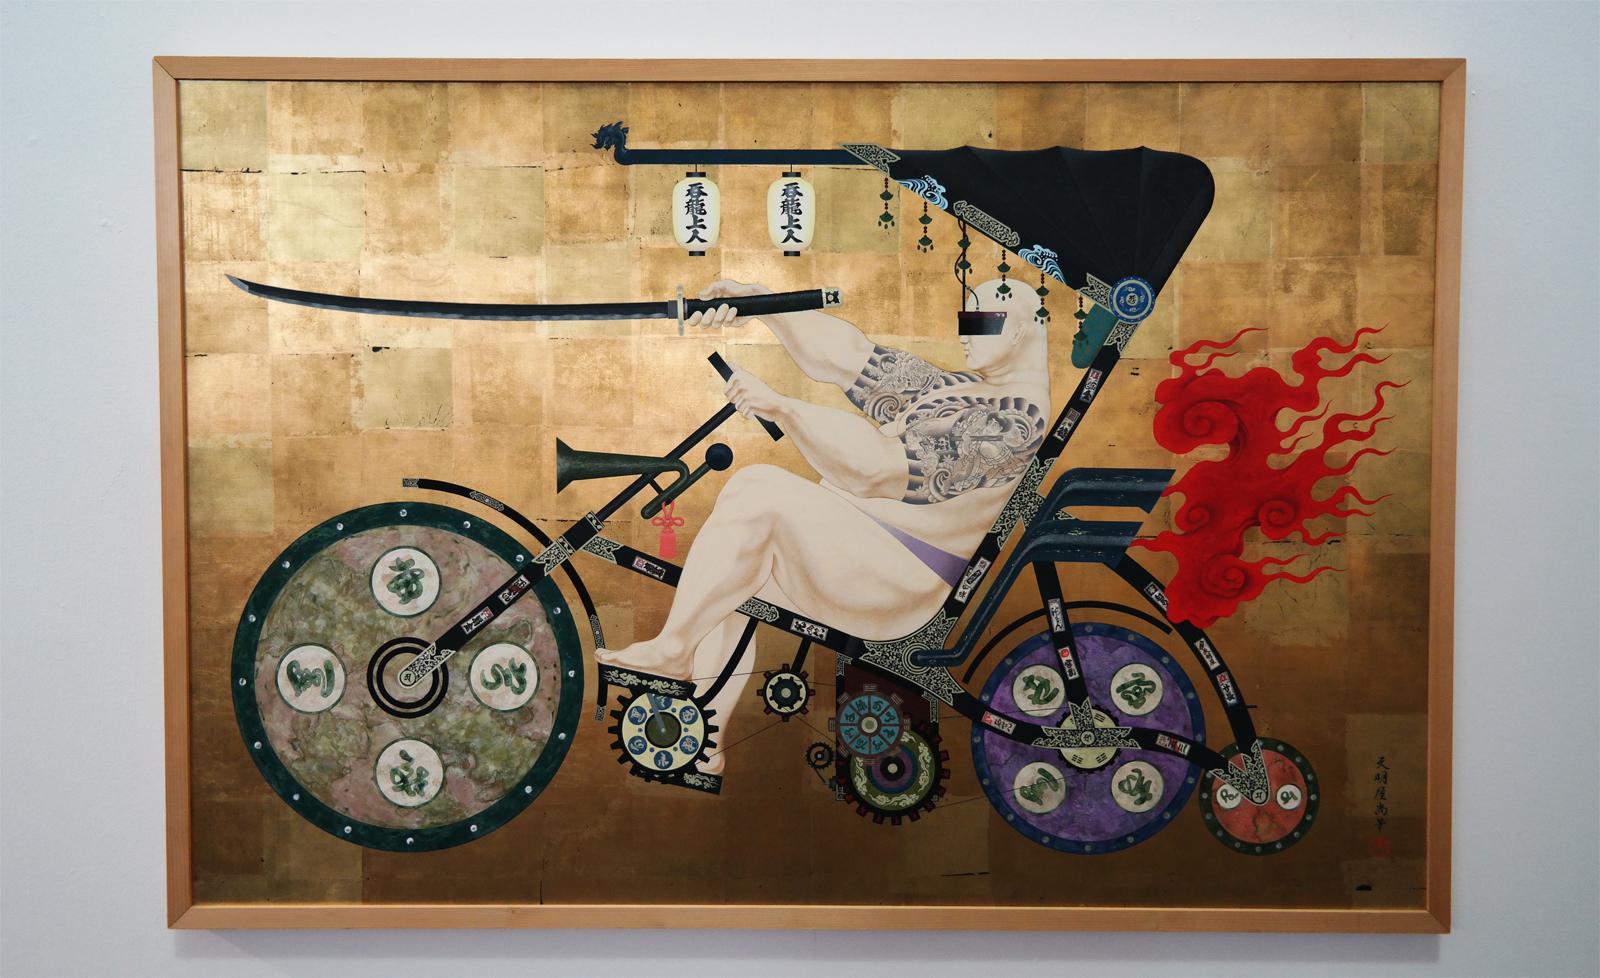 Japanese Spirit #2, 1997, Hisashi Tenmyouya